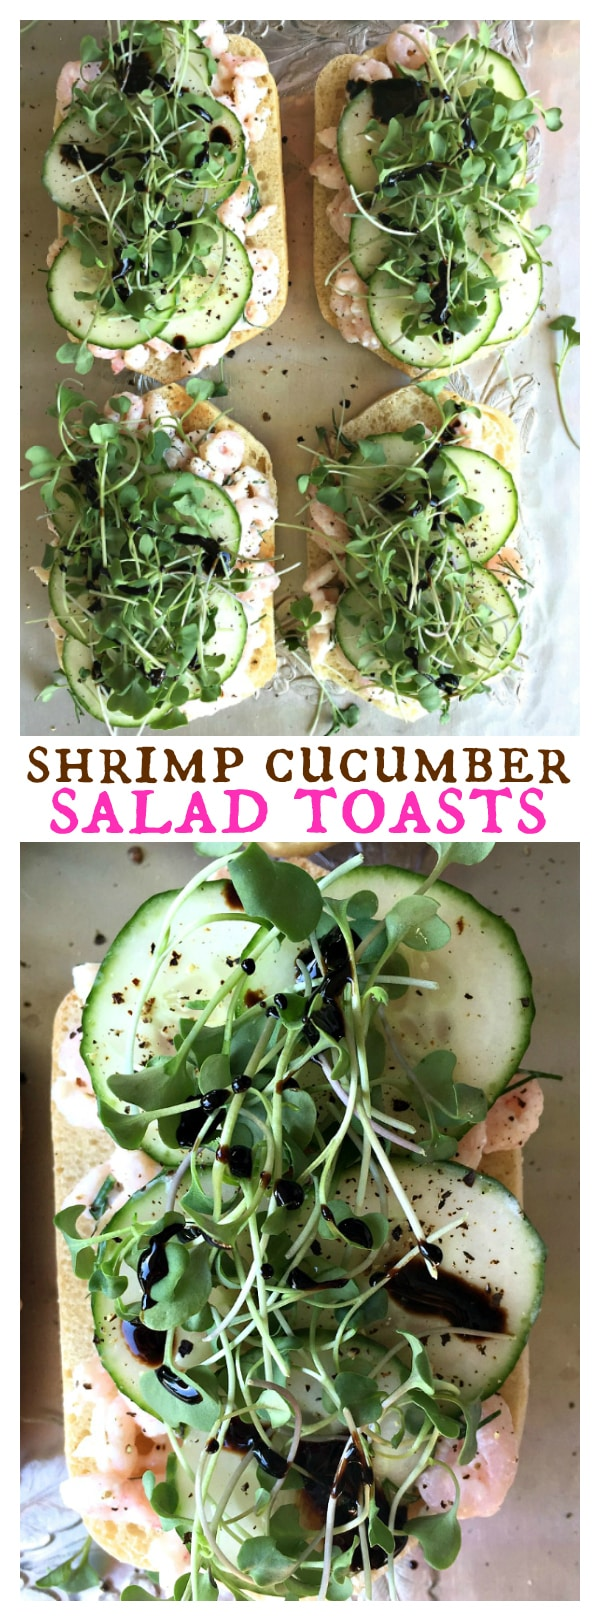 Shrimp Cucumber Salad Toasts